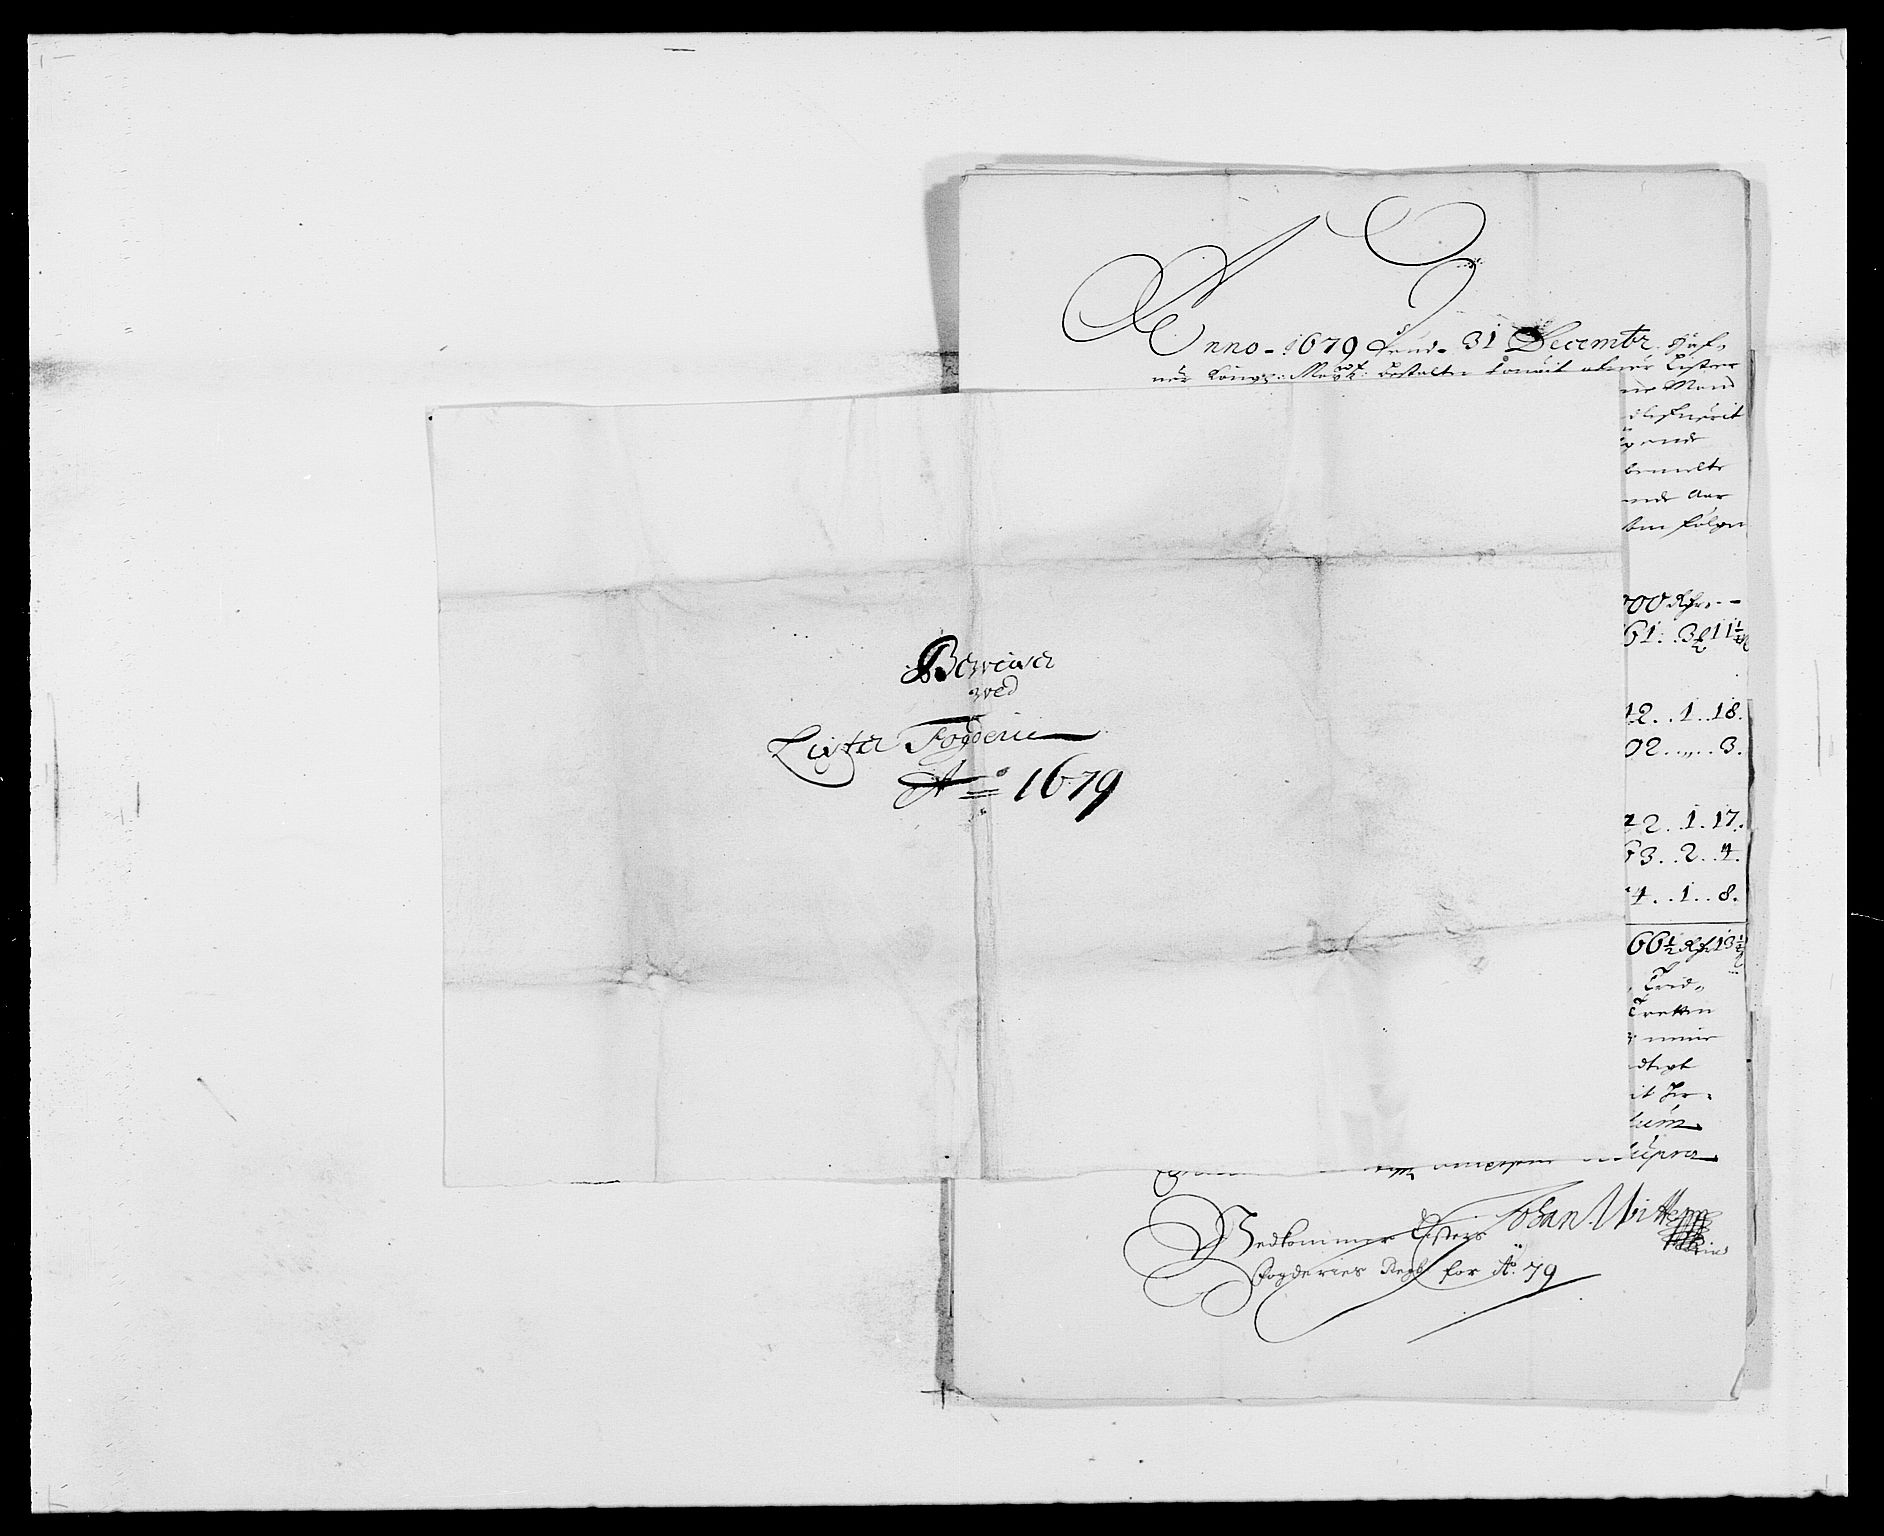 RA, Rentekammeret inntil 1814, Reviderte regnskaper, Fogderegnskap, R41/L2530: Fogderegnskap Lista, 1677-1679, s. 367